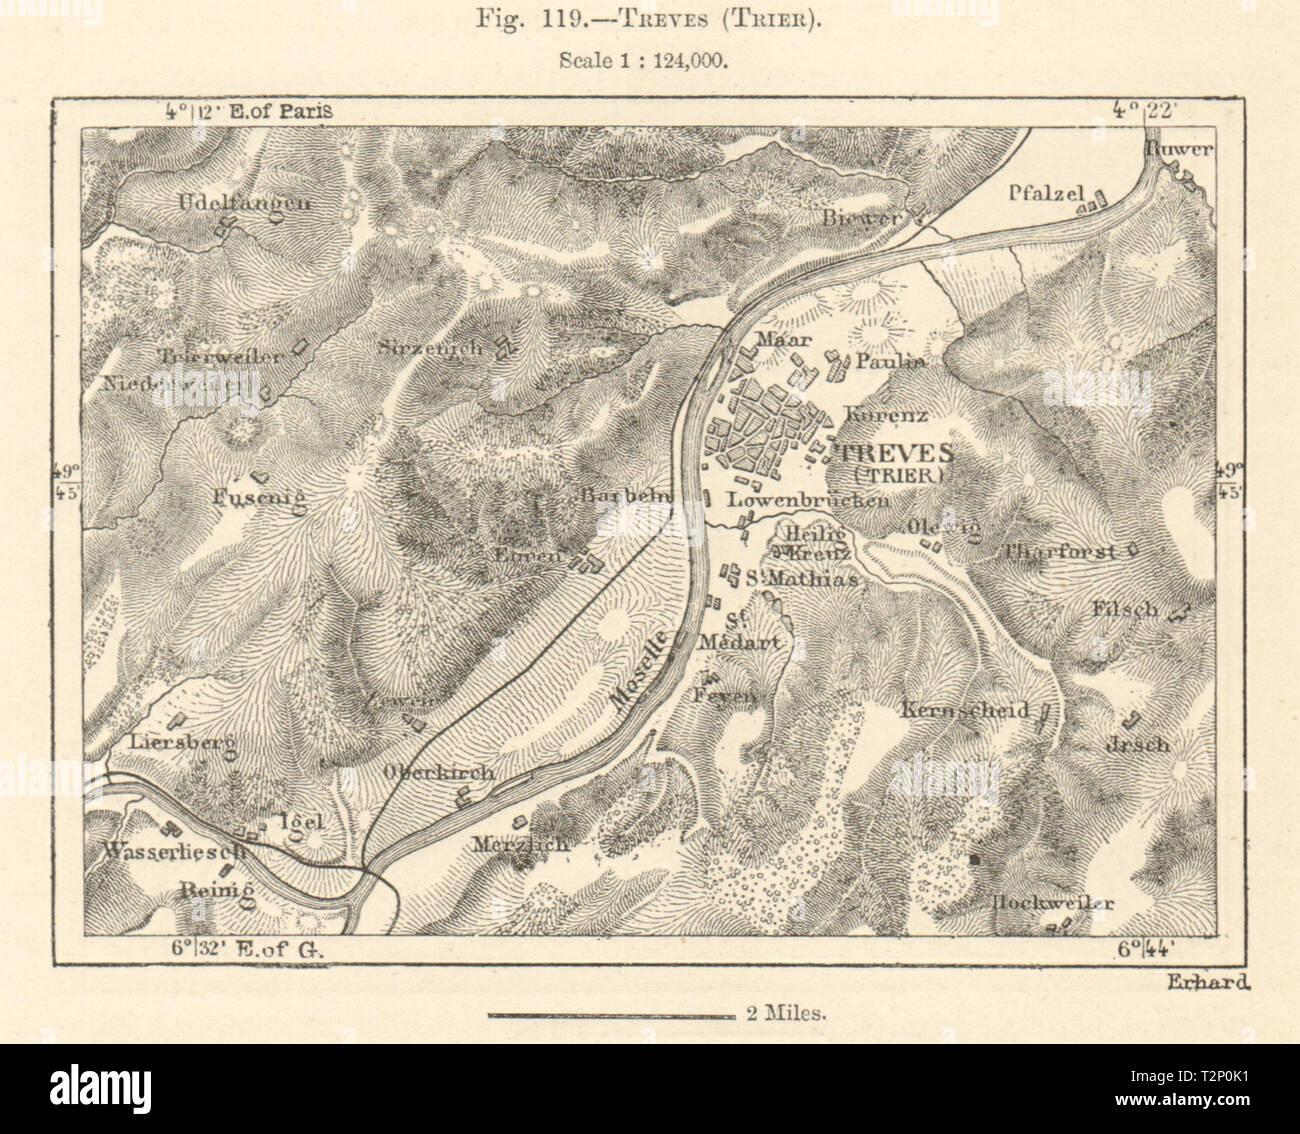 Trier Karte Umgebung.Trier Trier Umgebung Rheinland Pfalz Mosel Kartenskizze 1885